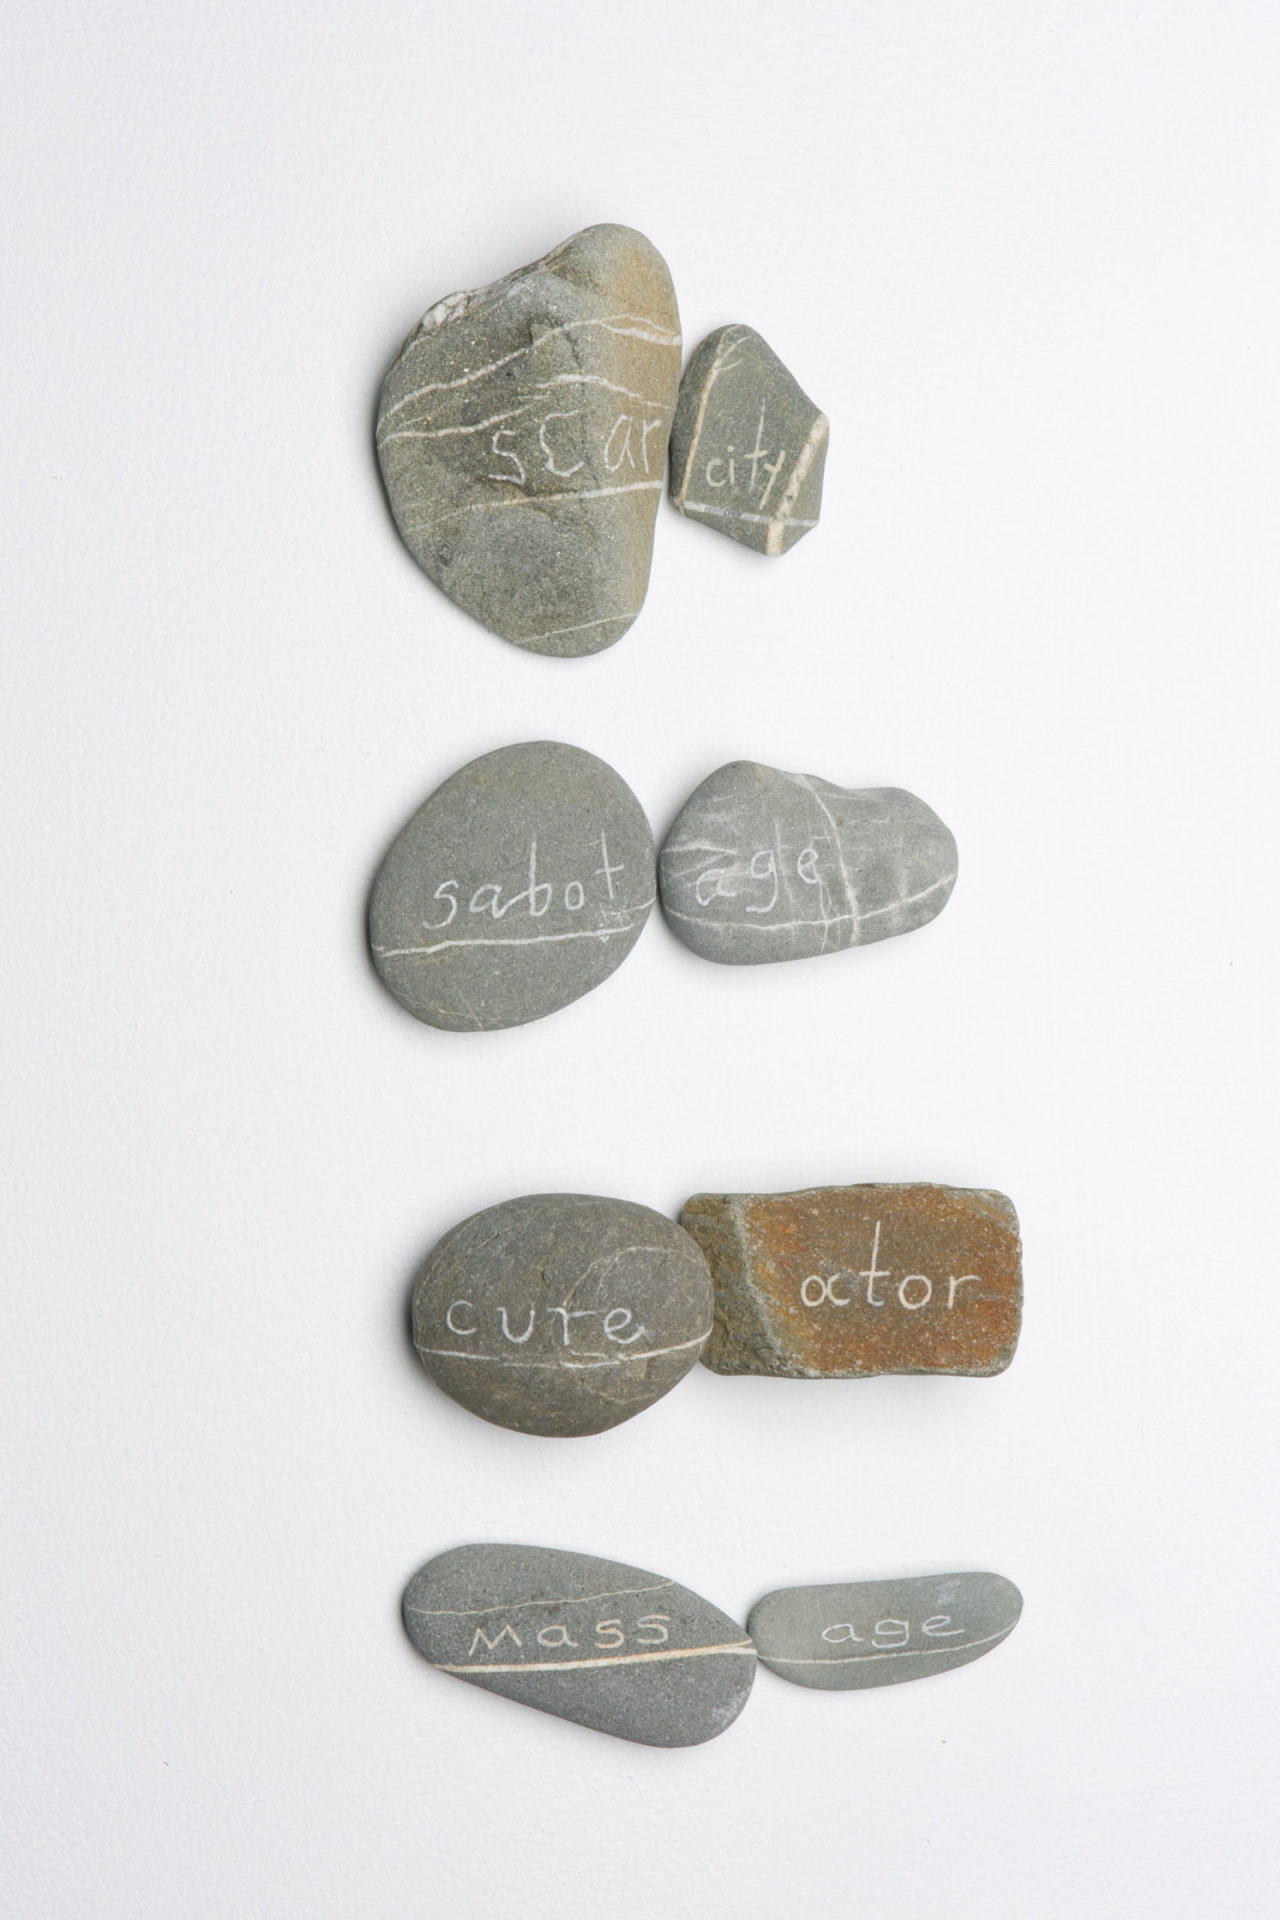 Rock Poem - Scarcity 2013 engraved beach stone with cross contour of quartz